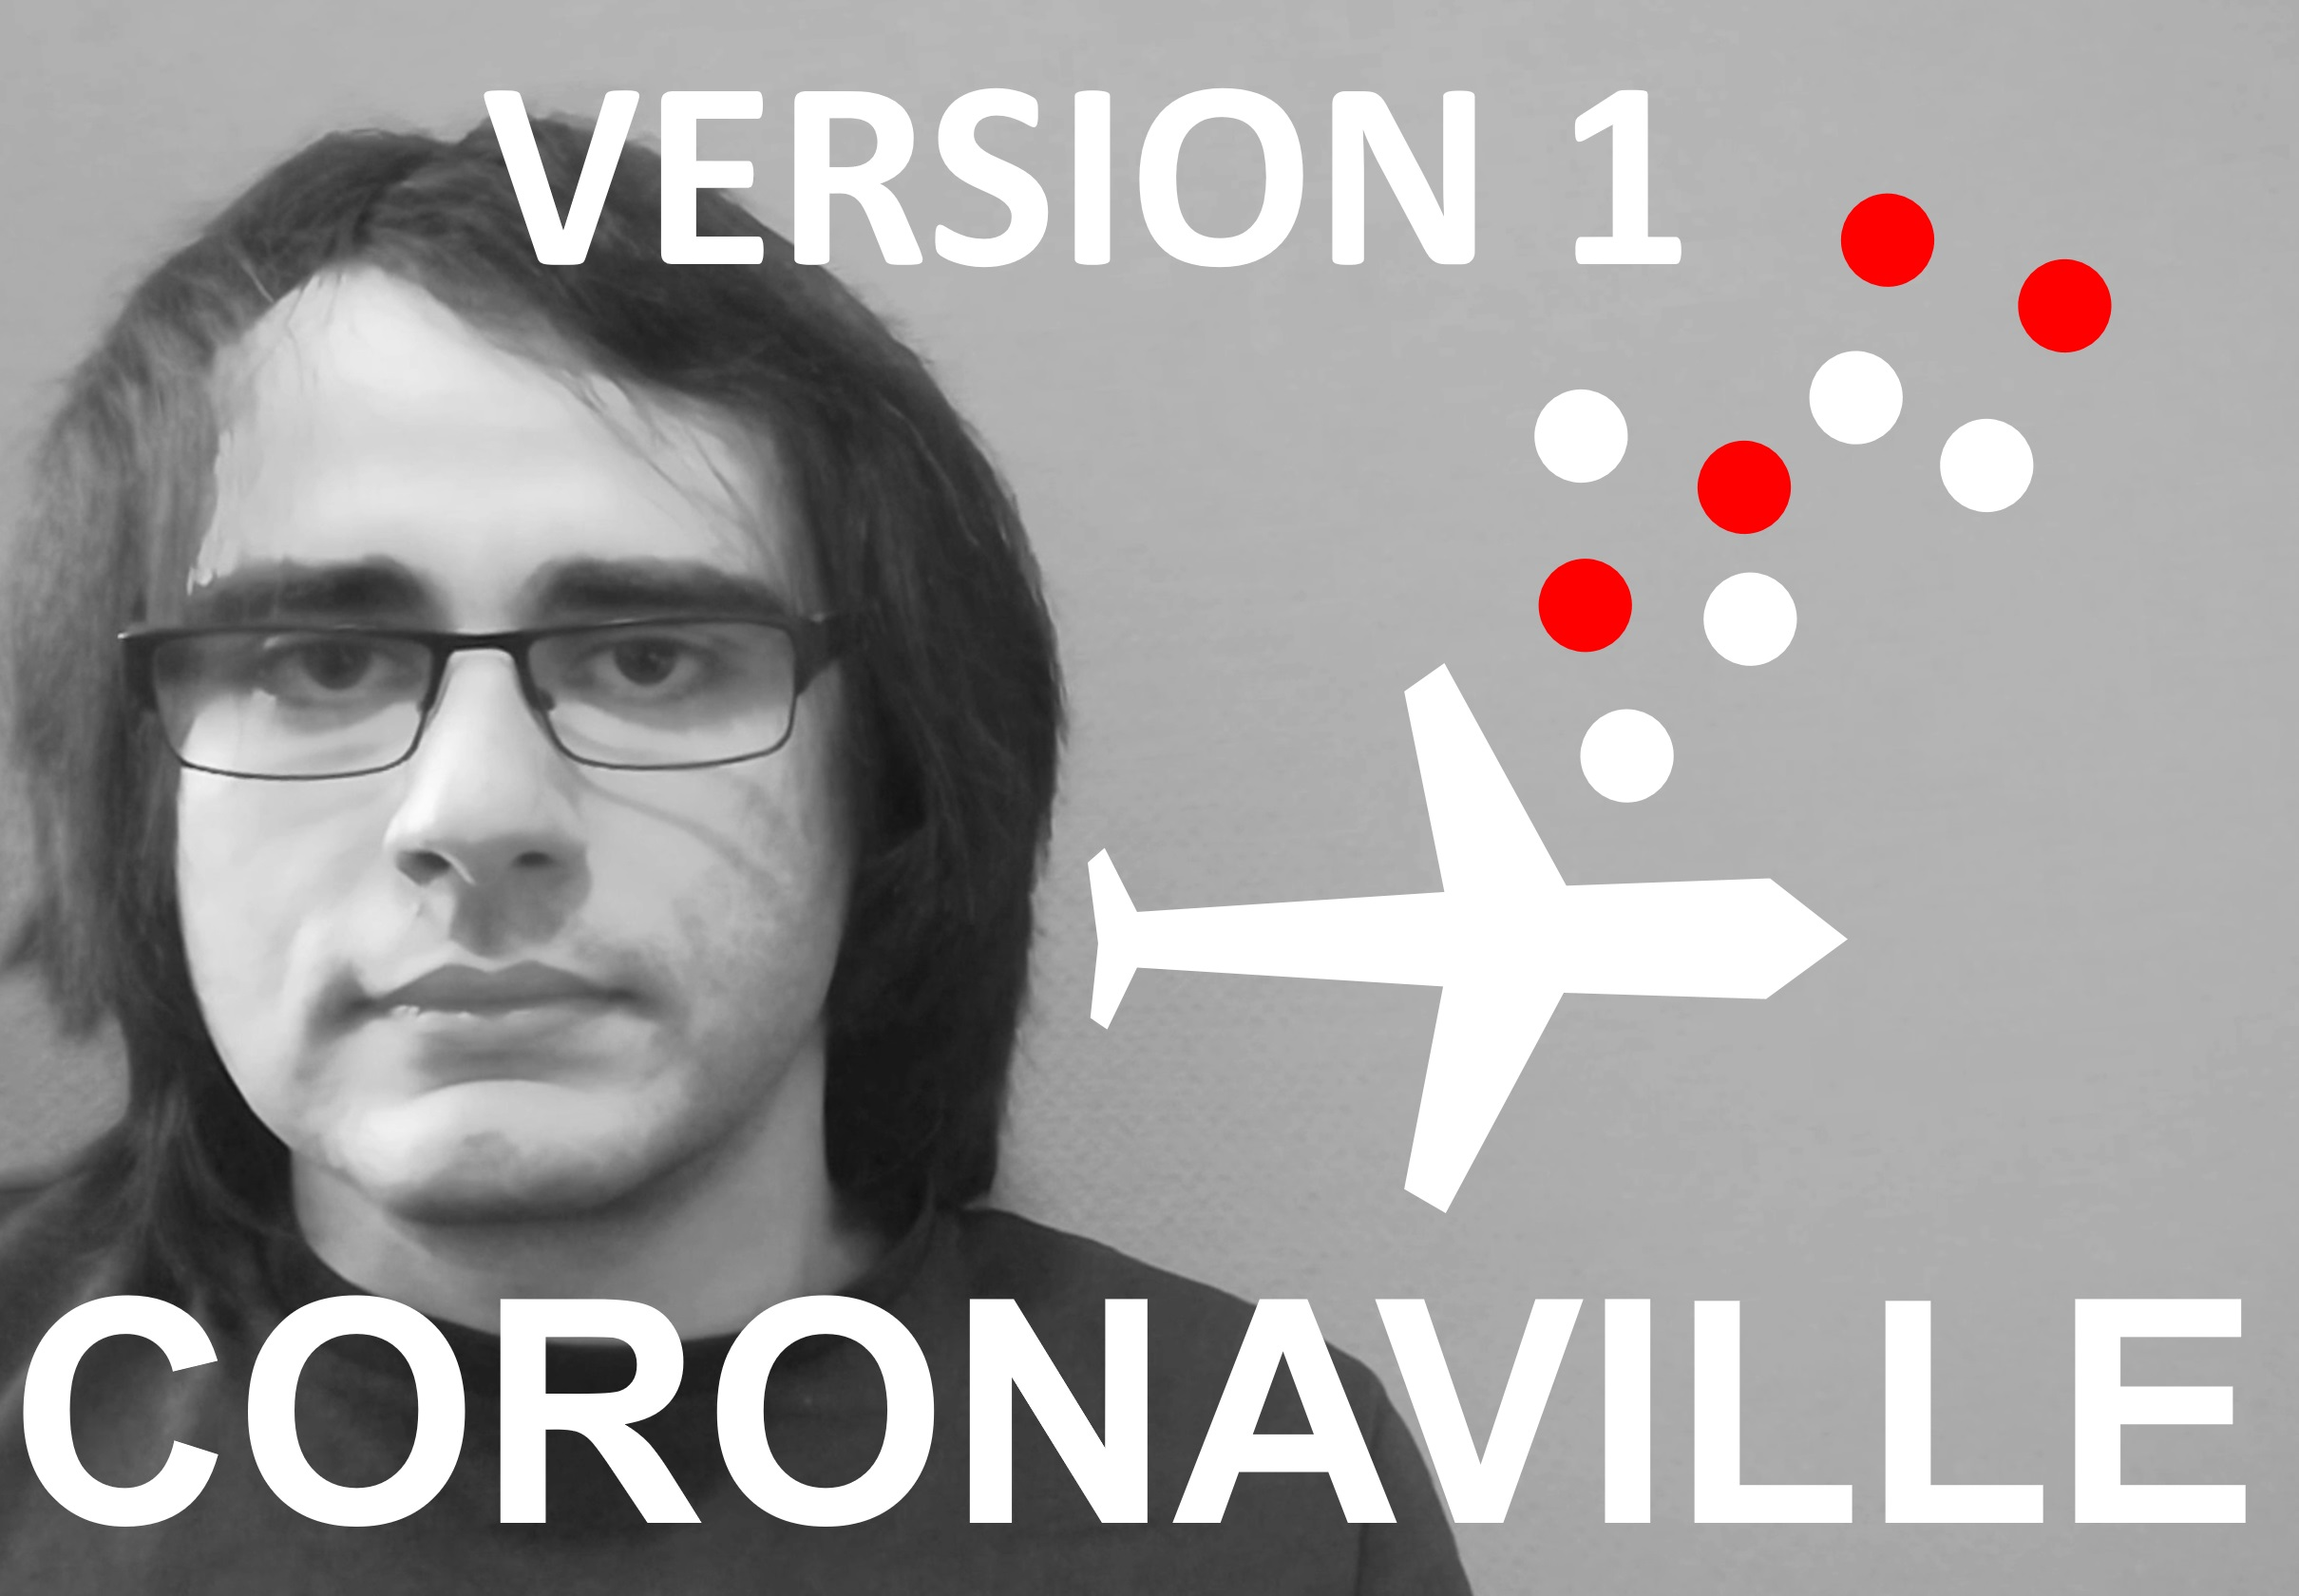 Coronaville